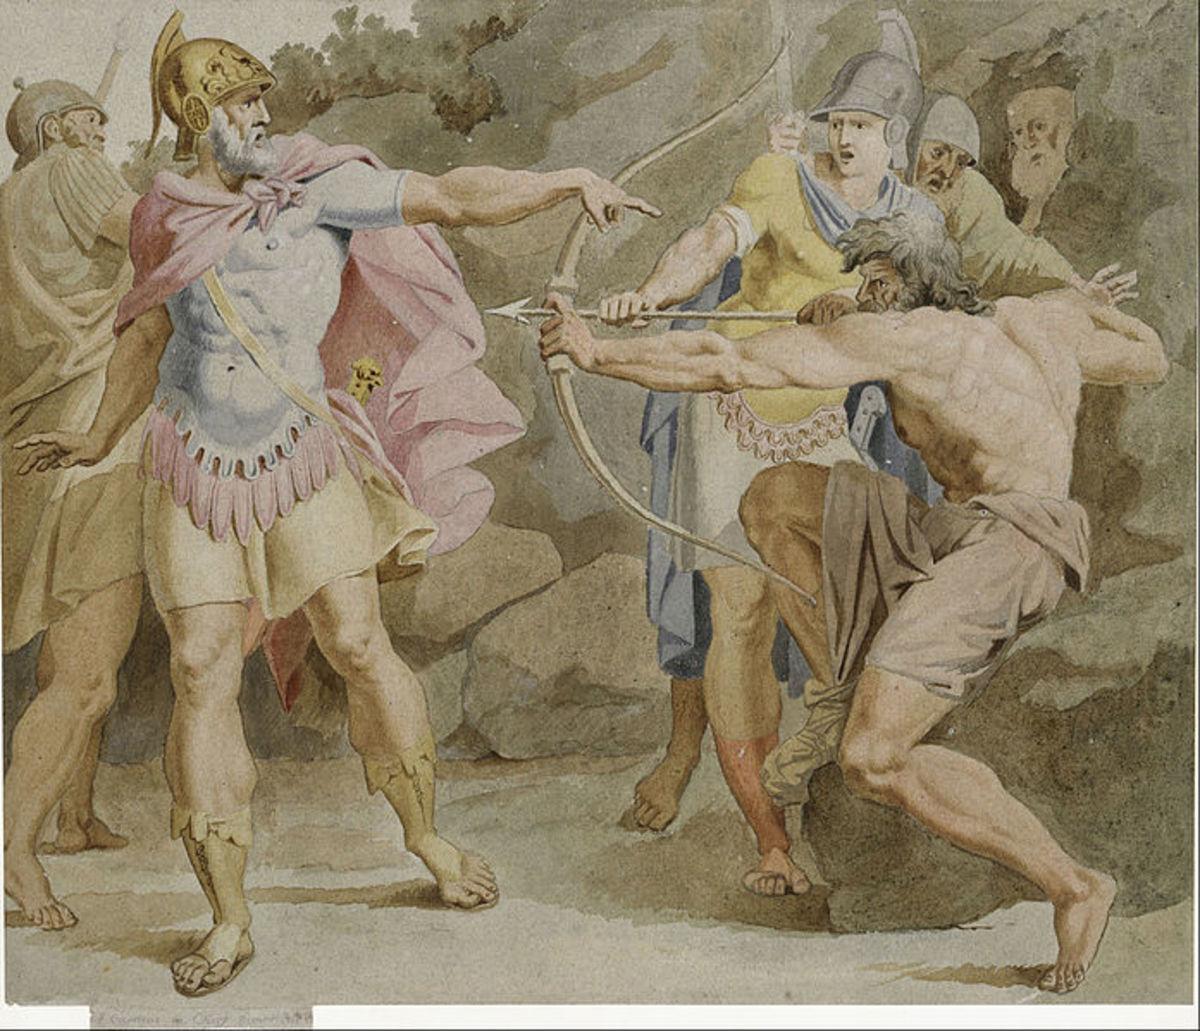 Asmus Jacob Carstens (1754–1798) PD-art-100